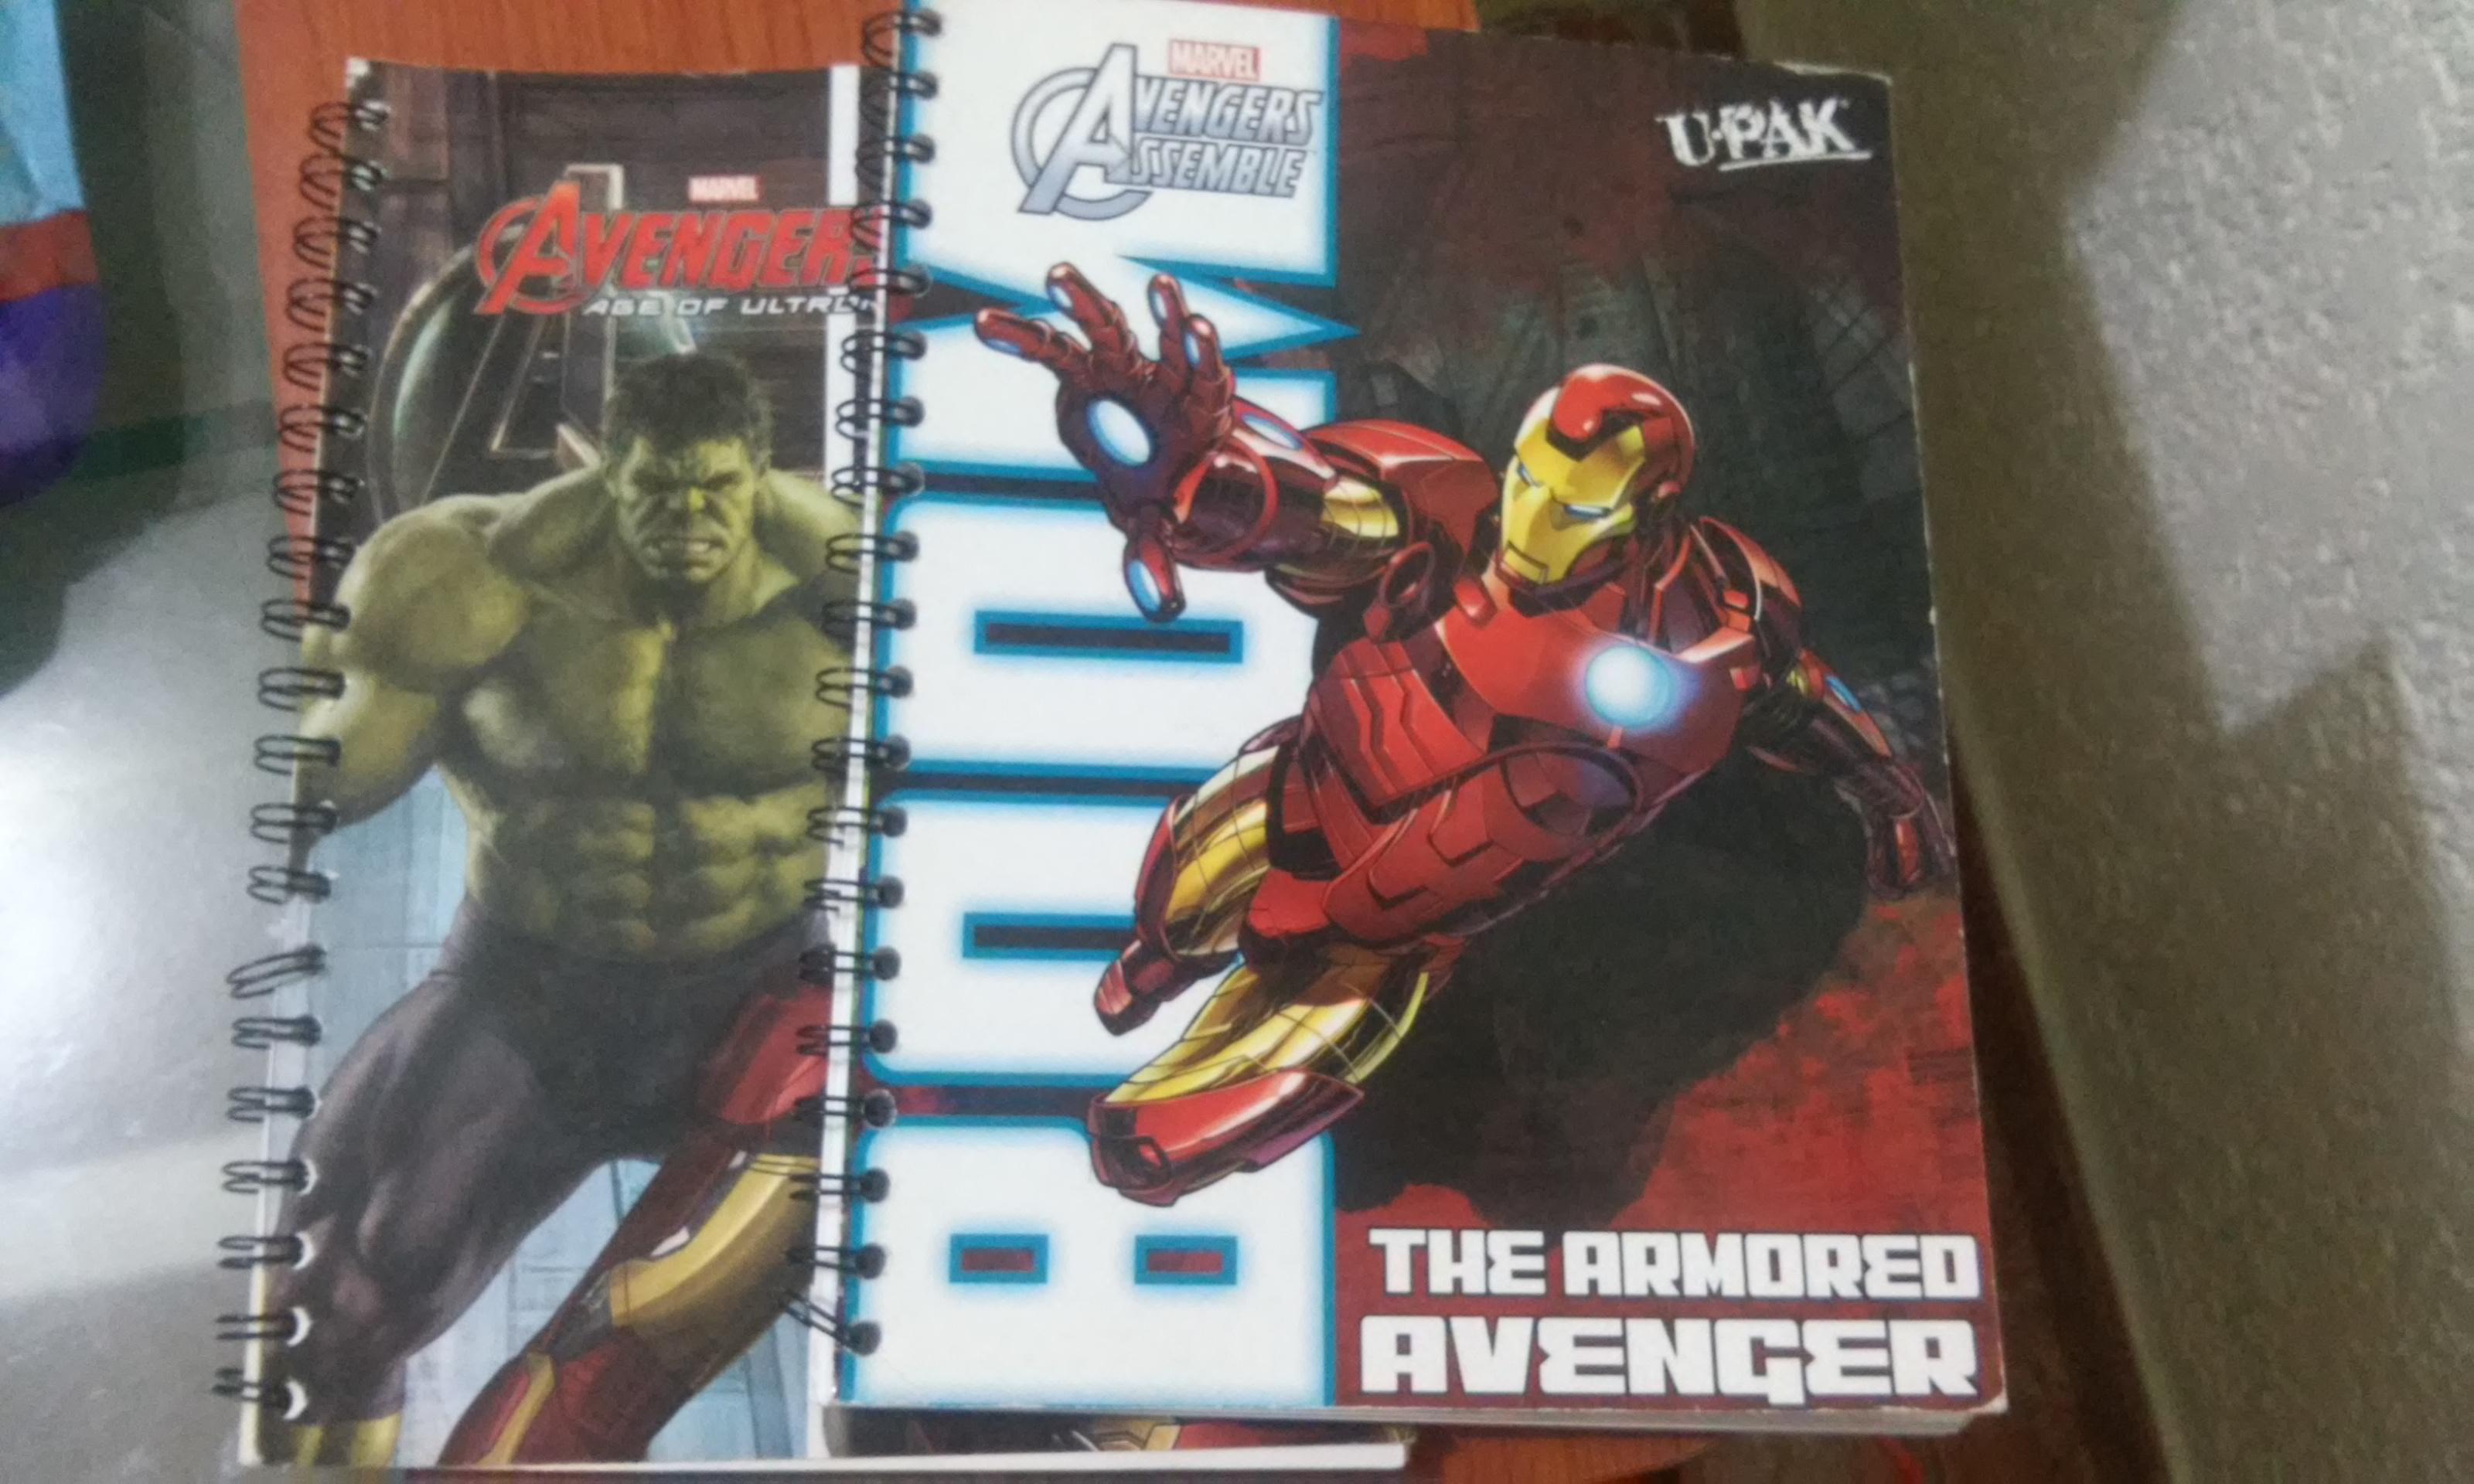 Walmart: Cuaderno Avengers $7.02